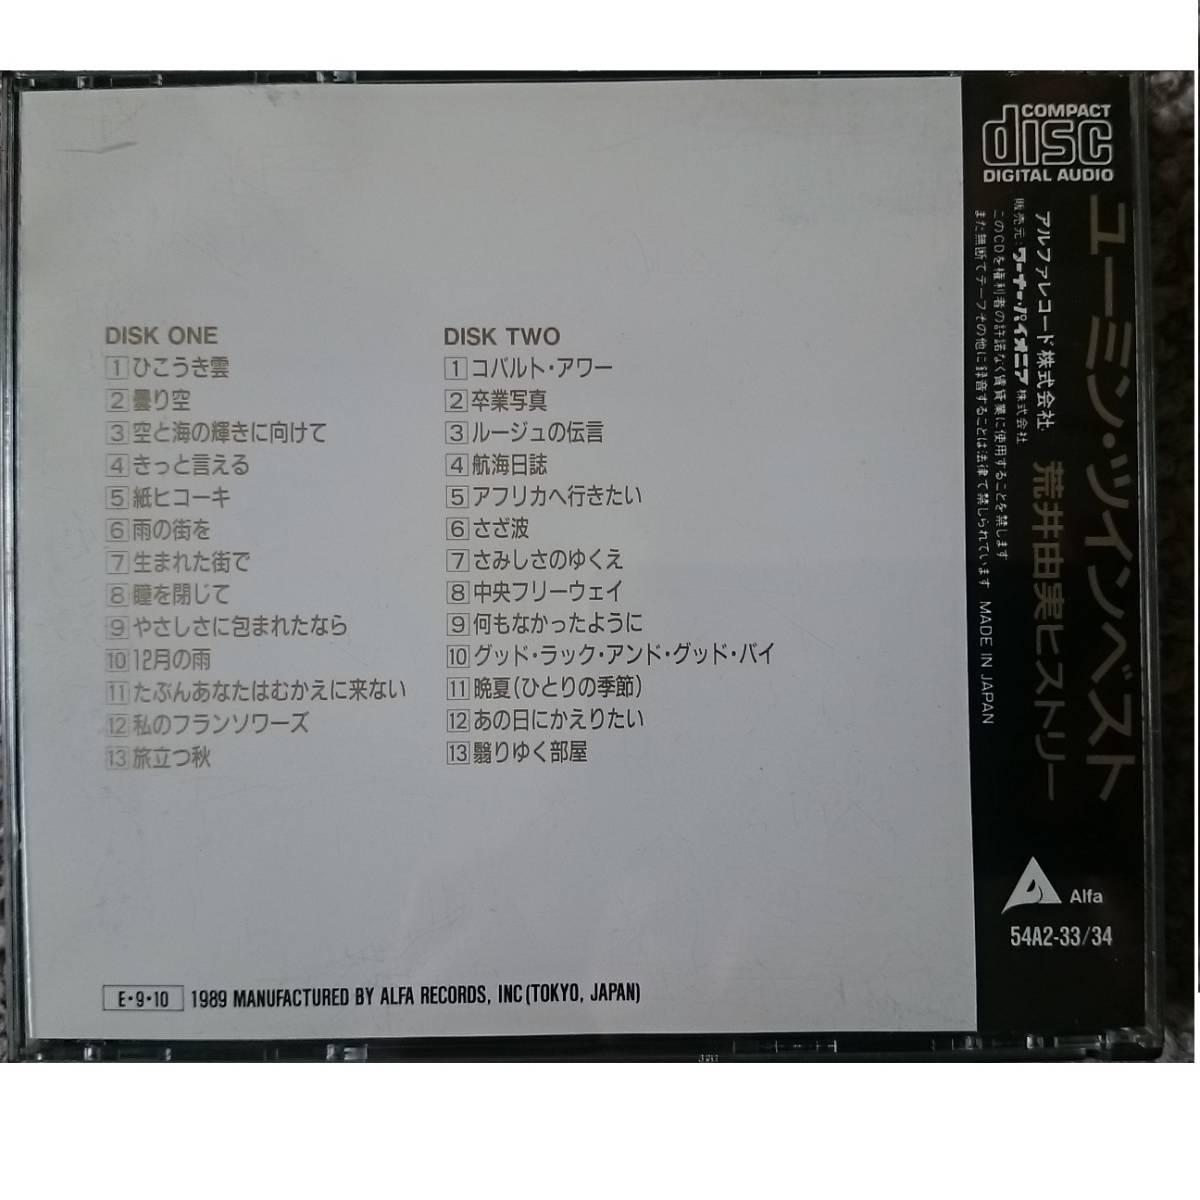 KF  荒井由実 松任谷由実  ユーミン・ツインベスト ゴールドCD 初回生産限定盤 24K_画像4